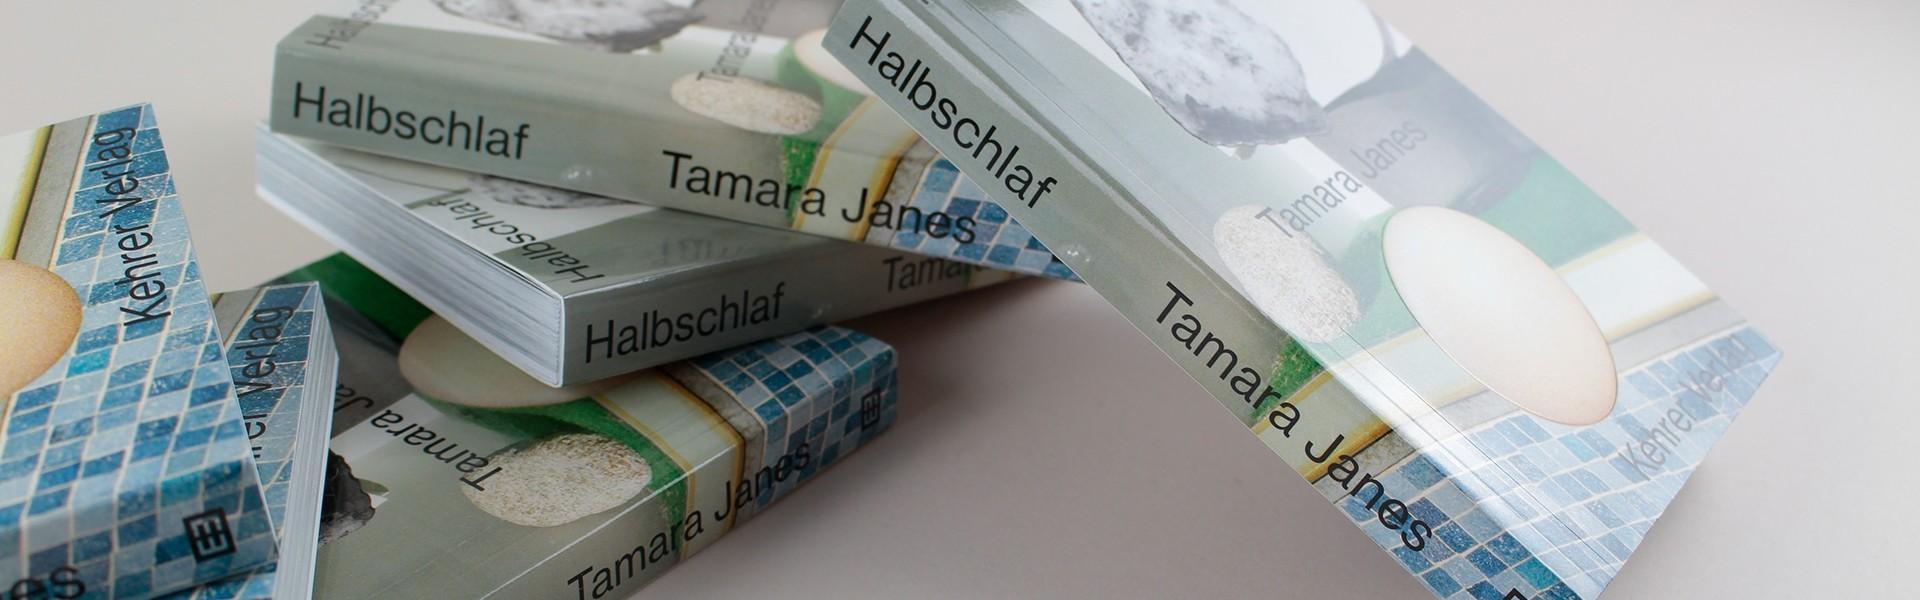 Tamara Janes Halbschlaf